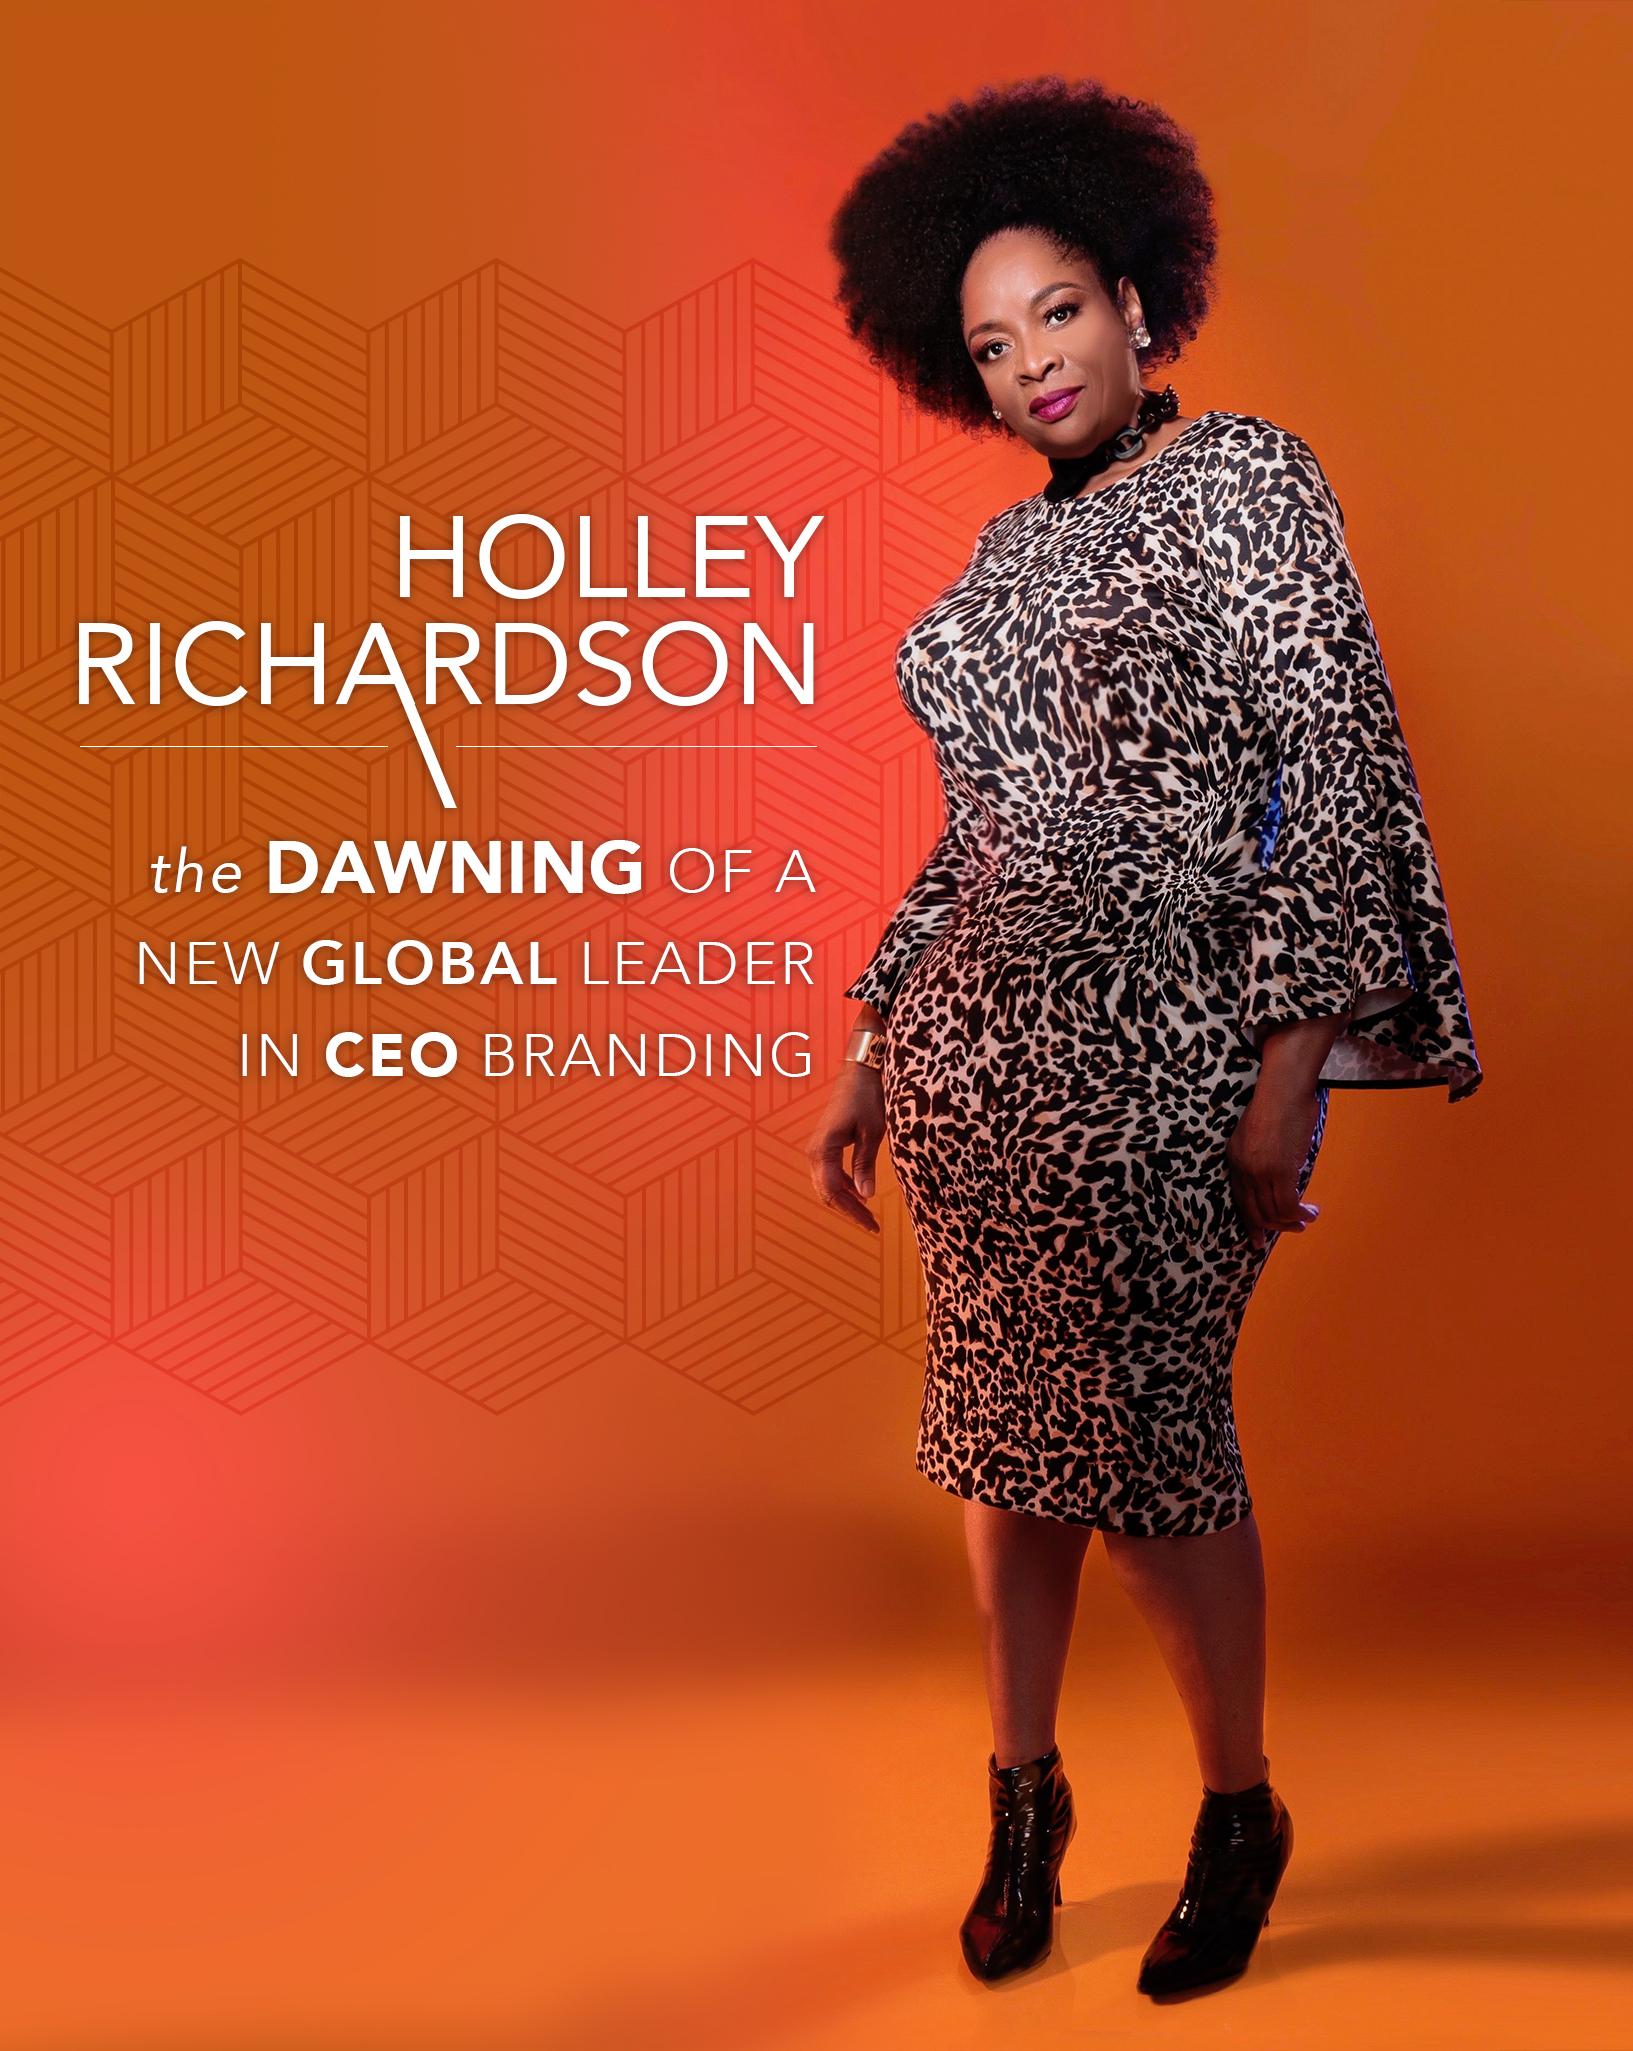 Holley Richardson